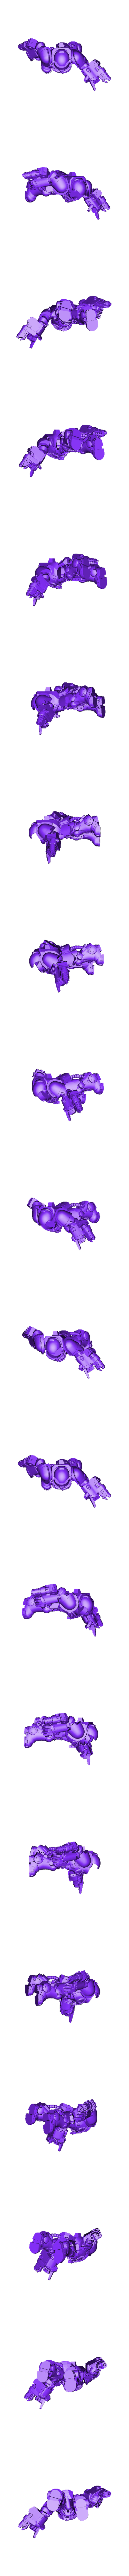 Sgt_1_Body.stl Download free STL file Flame Armed Instigators • 3D printable template, danny_cyanide